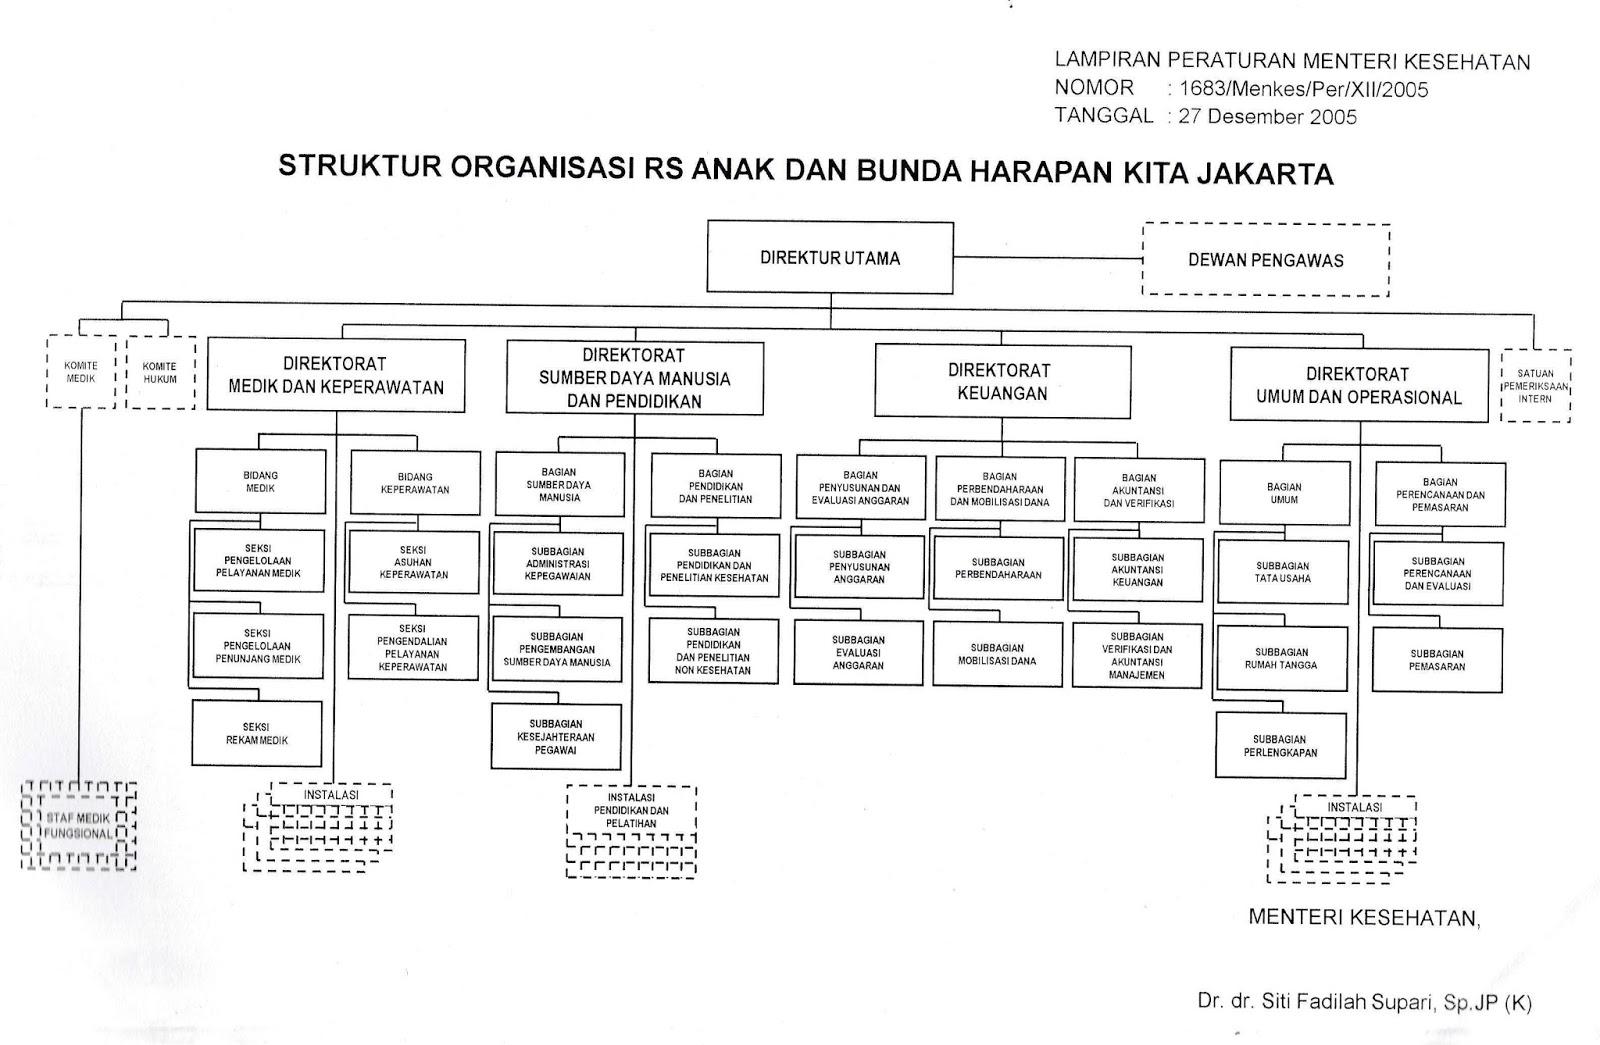 gambar struktur organisasi rumah sakit tipe d  gambar struktur organisasi rumah sakit tipe d